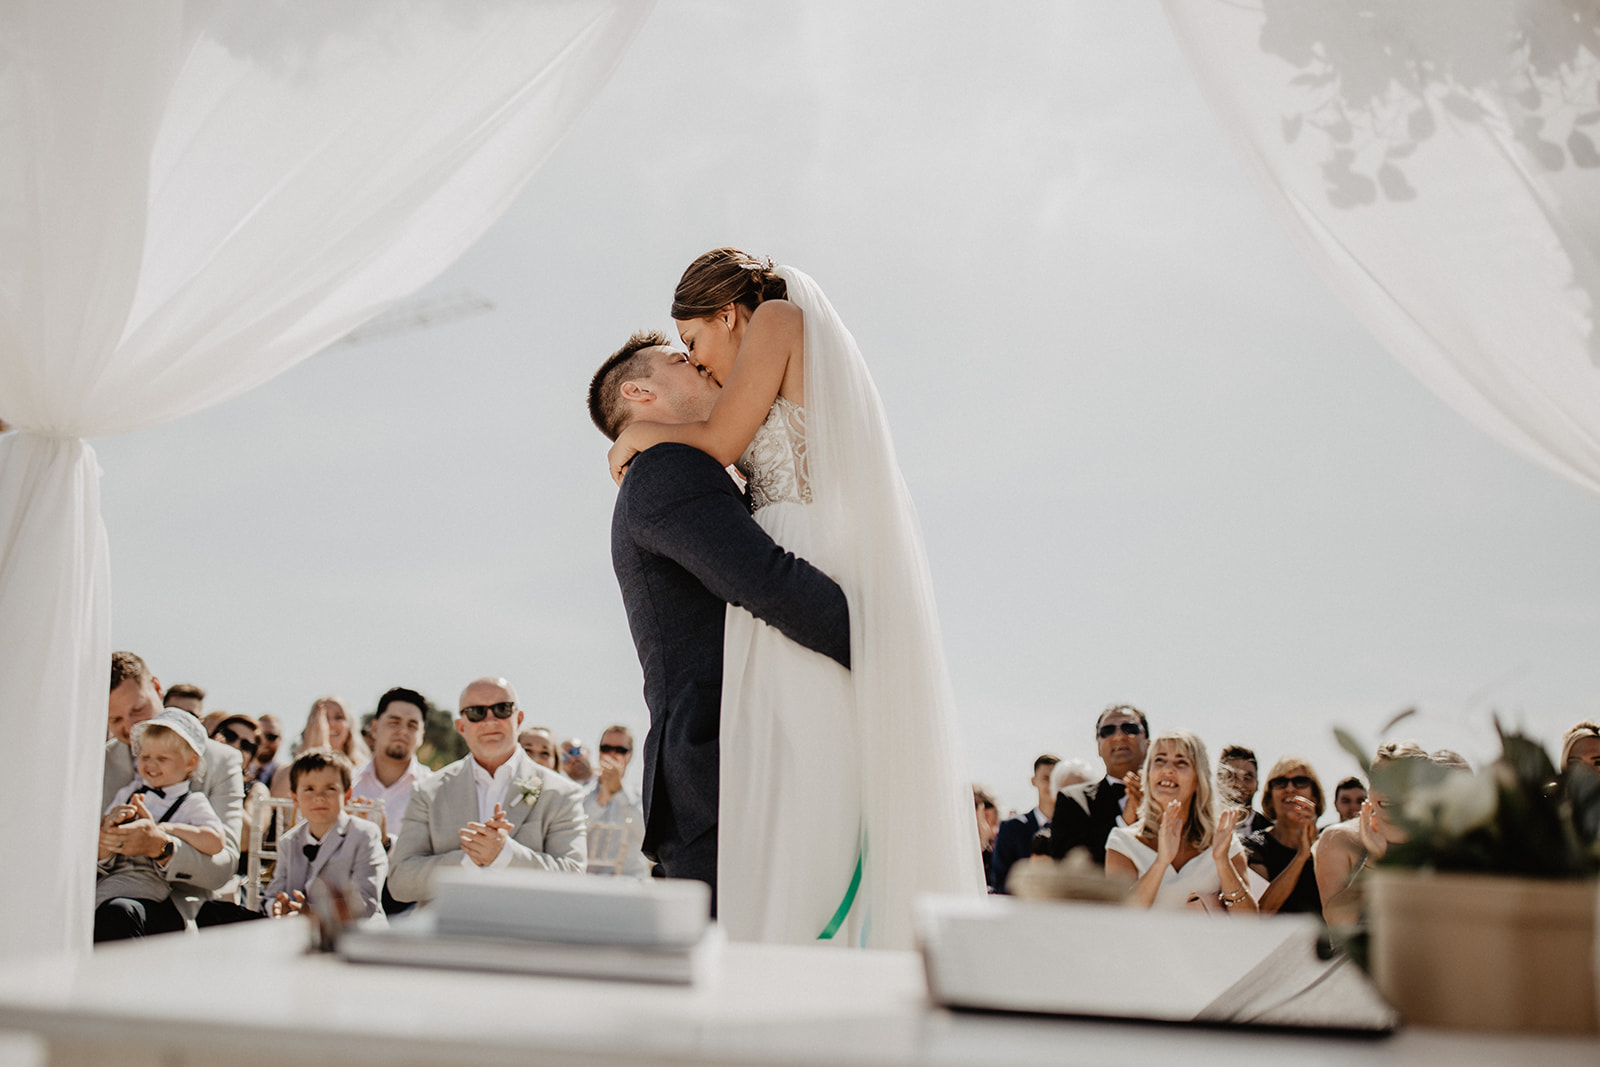 Lapela-photography-wedding-algarve-portugal-best-of-39.jpg